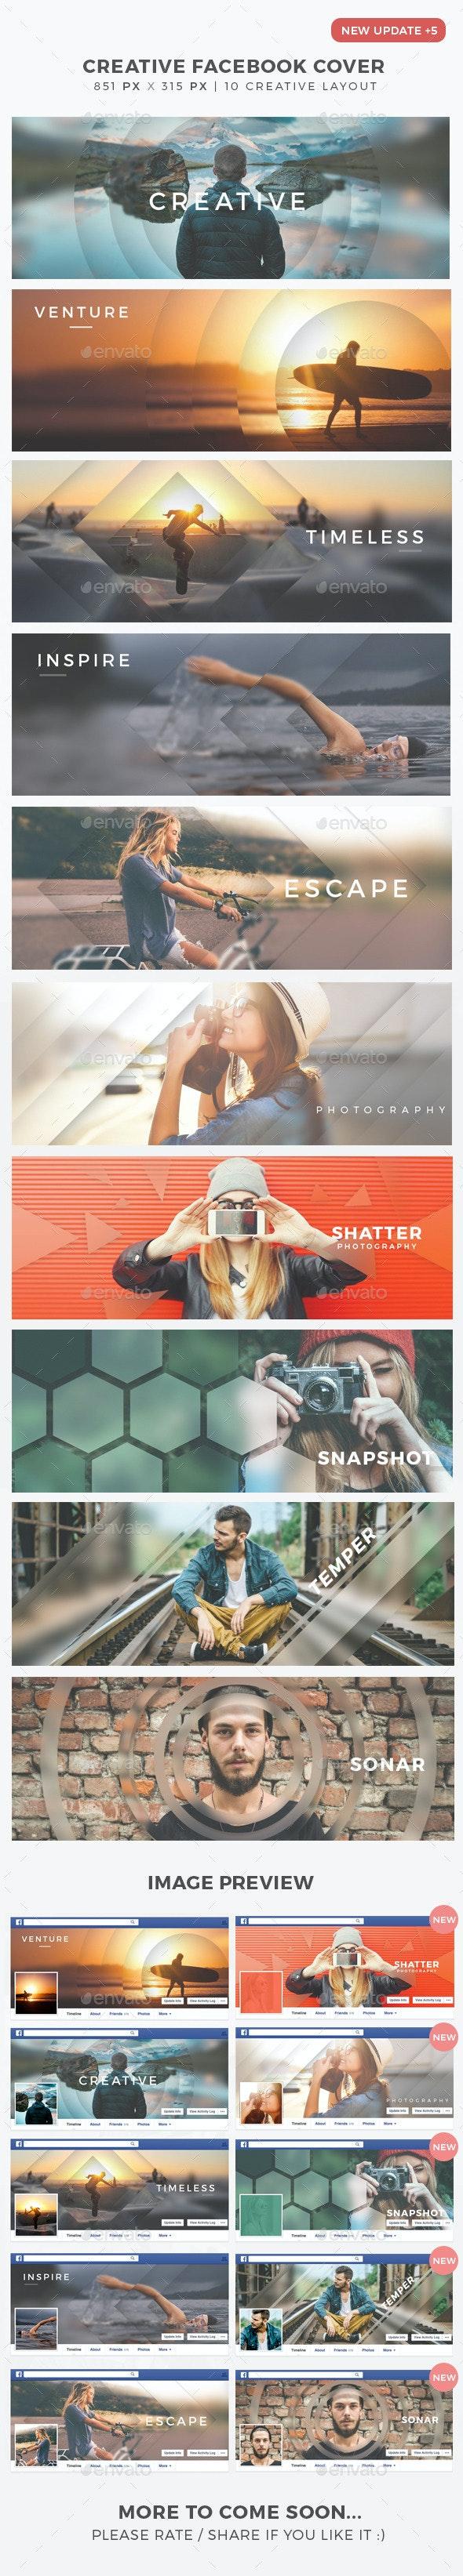 Creative Facebook Timeline Cover - Facebook Timeline Covers Social Media